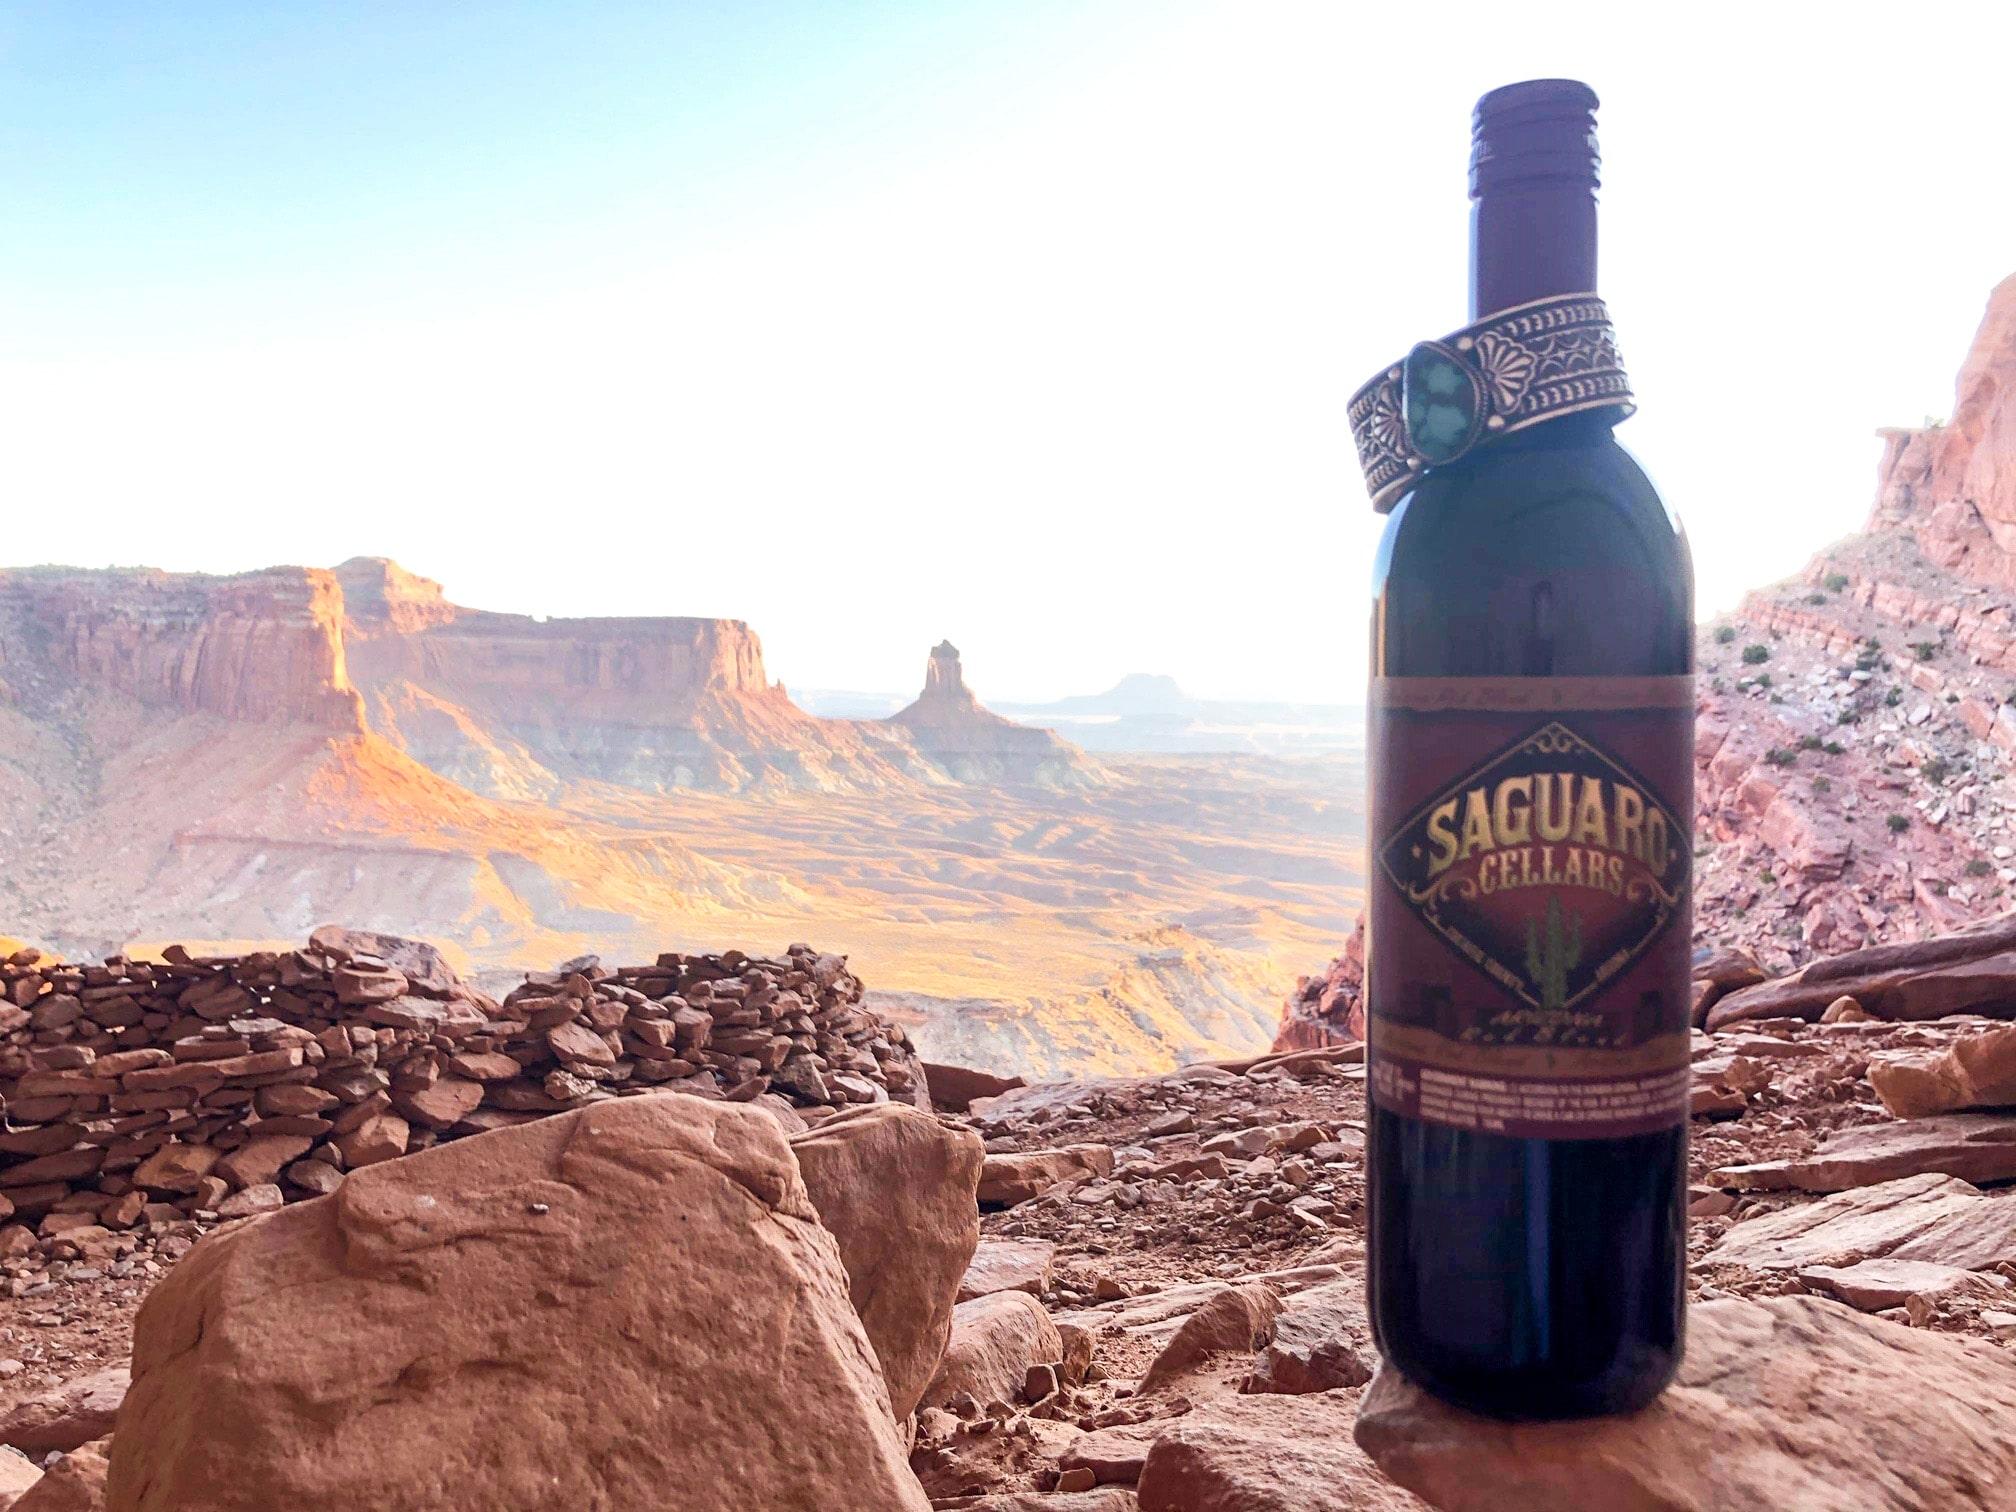 Wine Crusie - Saguaro Cellars